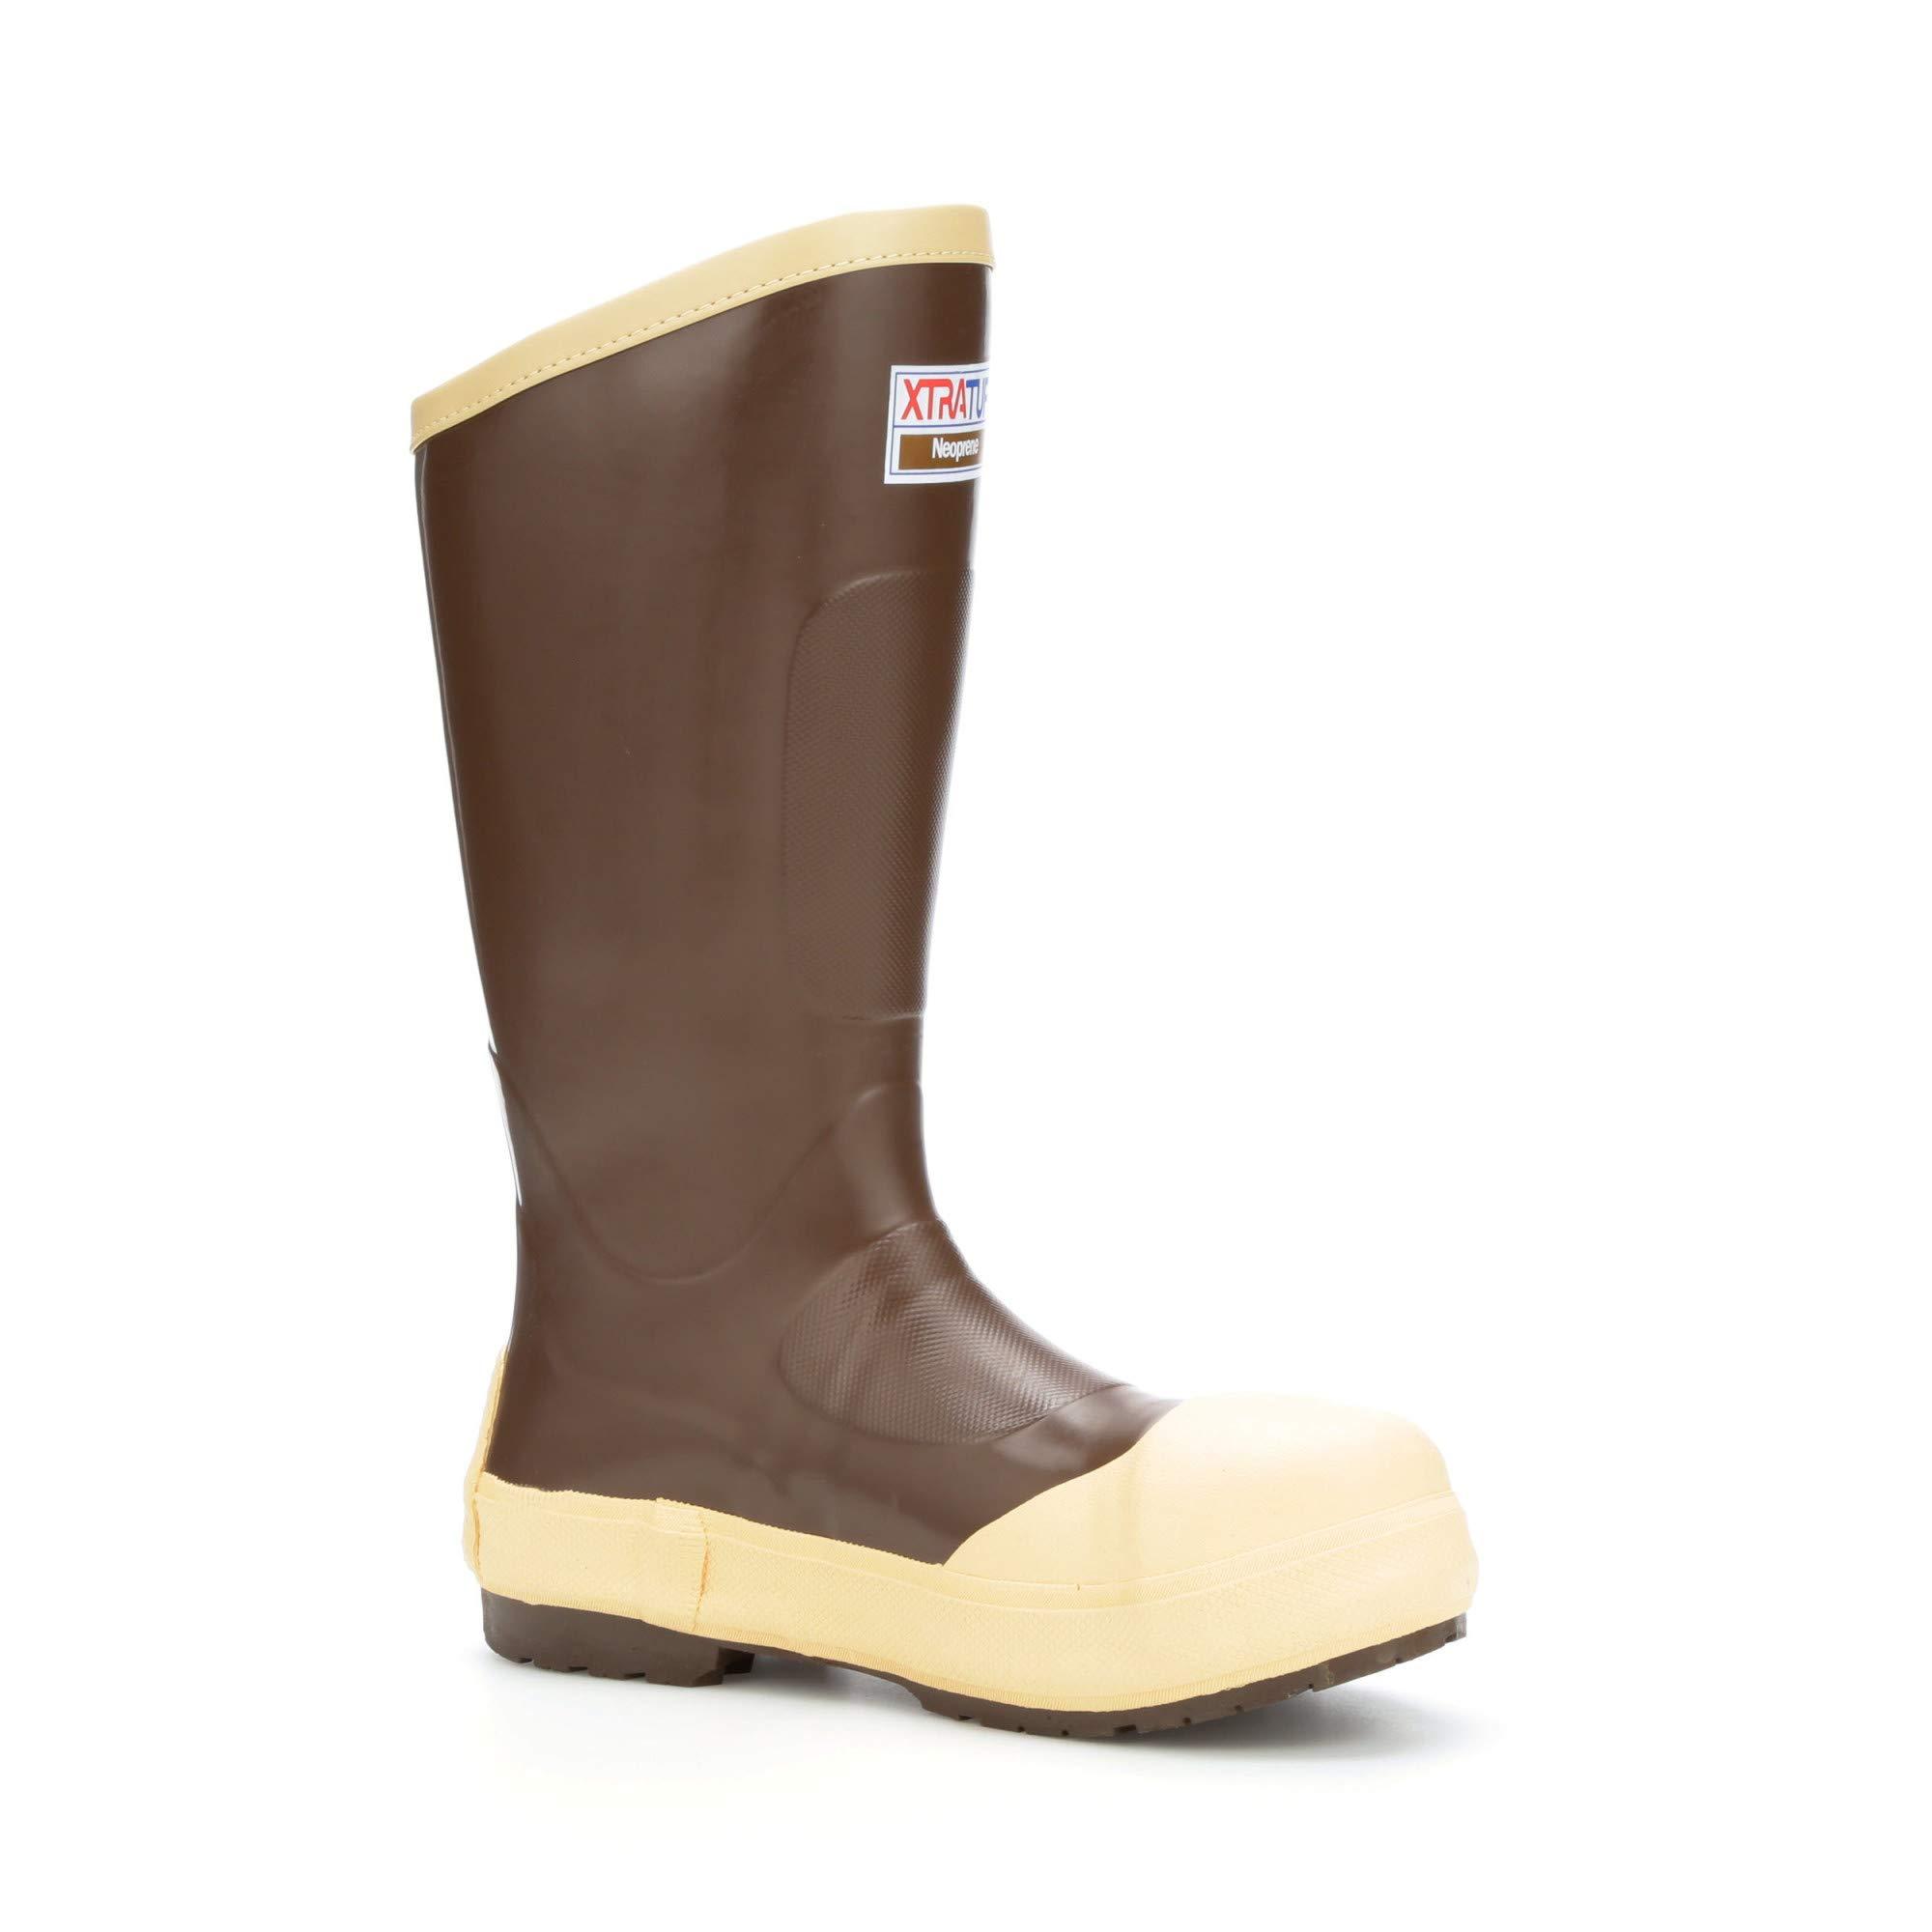 XTRATUF Legacy 2.0 Series 15'' Neoprene Composite Toe Men's Fishing Boots, Copper & Tan (22292G) by Xtratuf (Image #1)